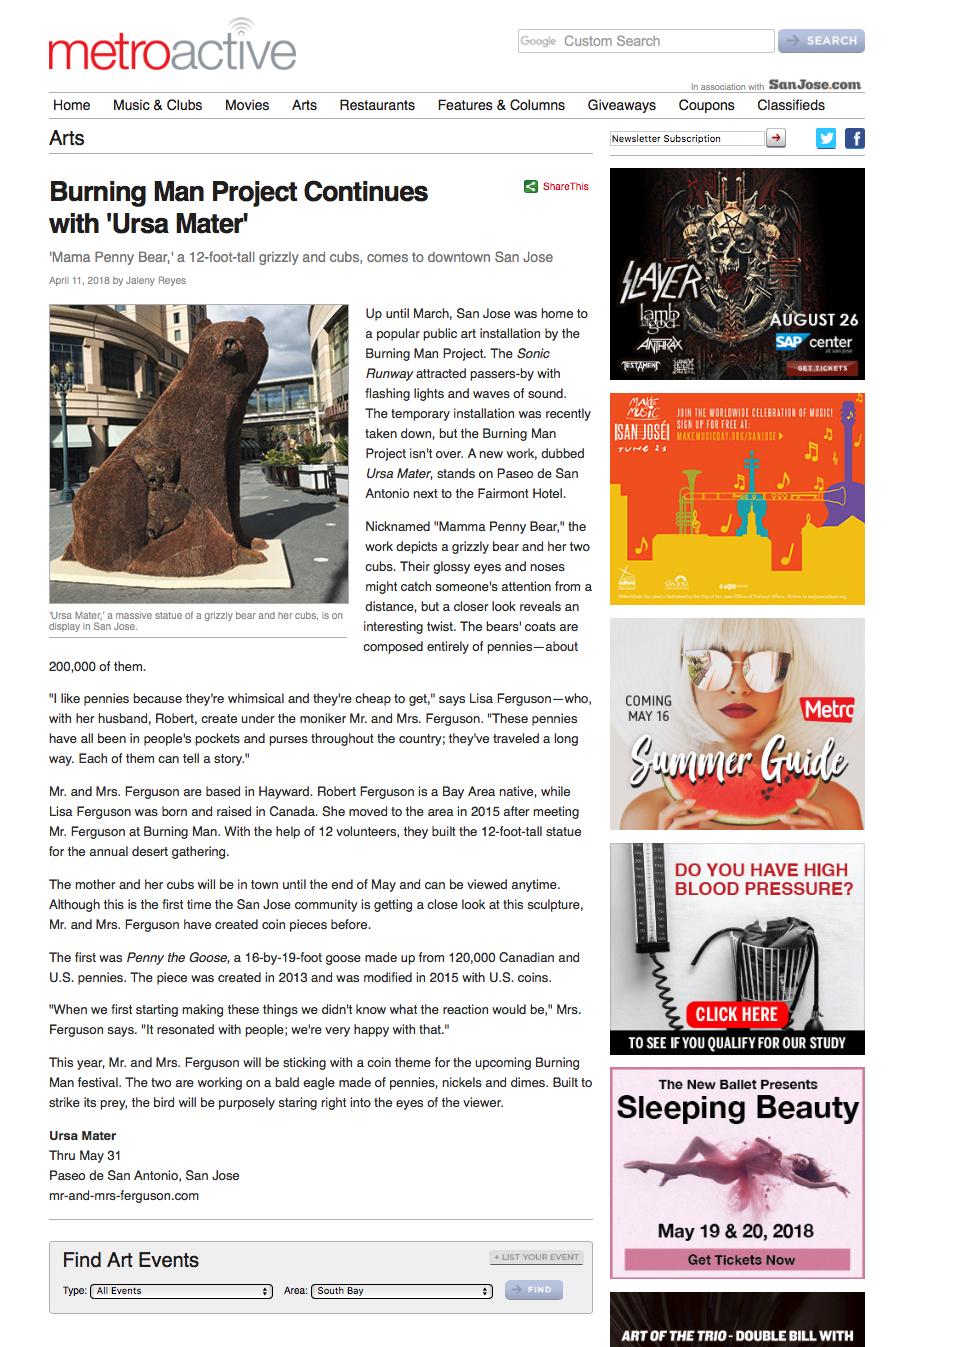 http://www.metroactive.com/arts/Ursa-Mater-Public-Art-Installation-San-Jose.html